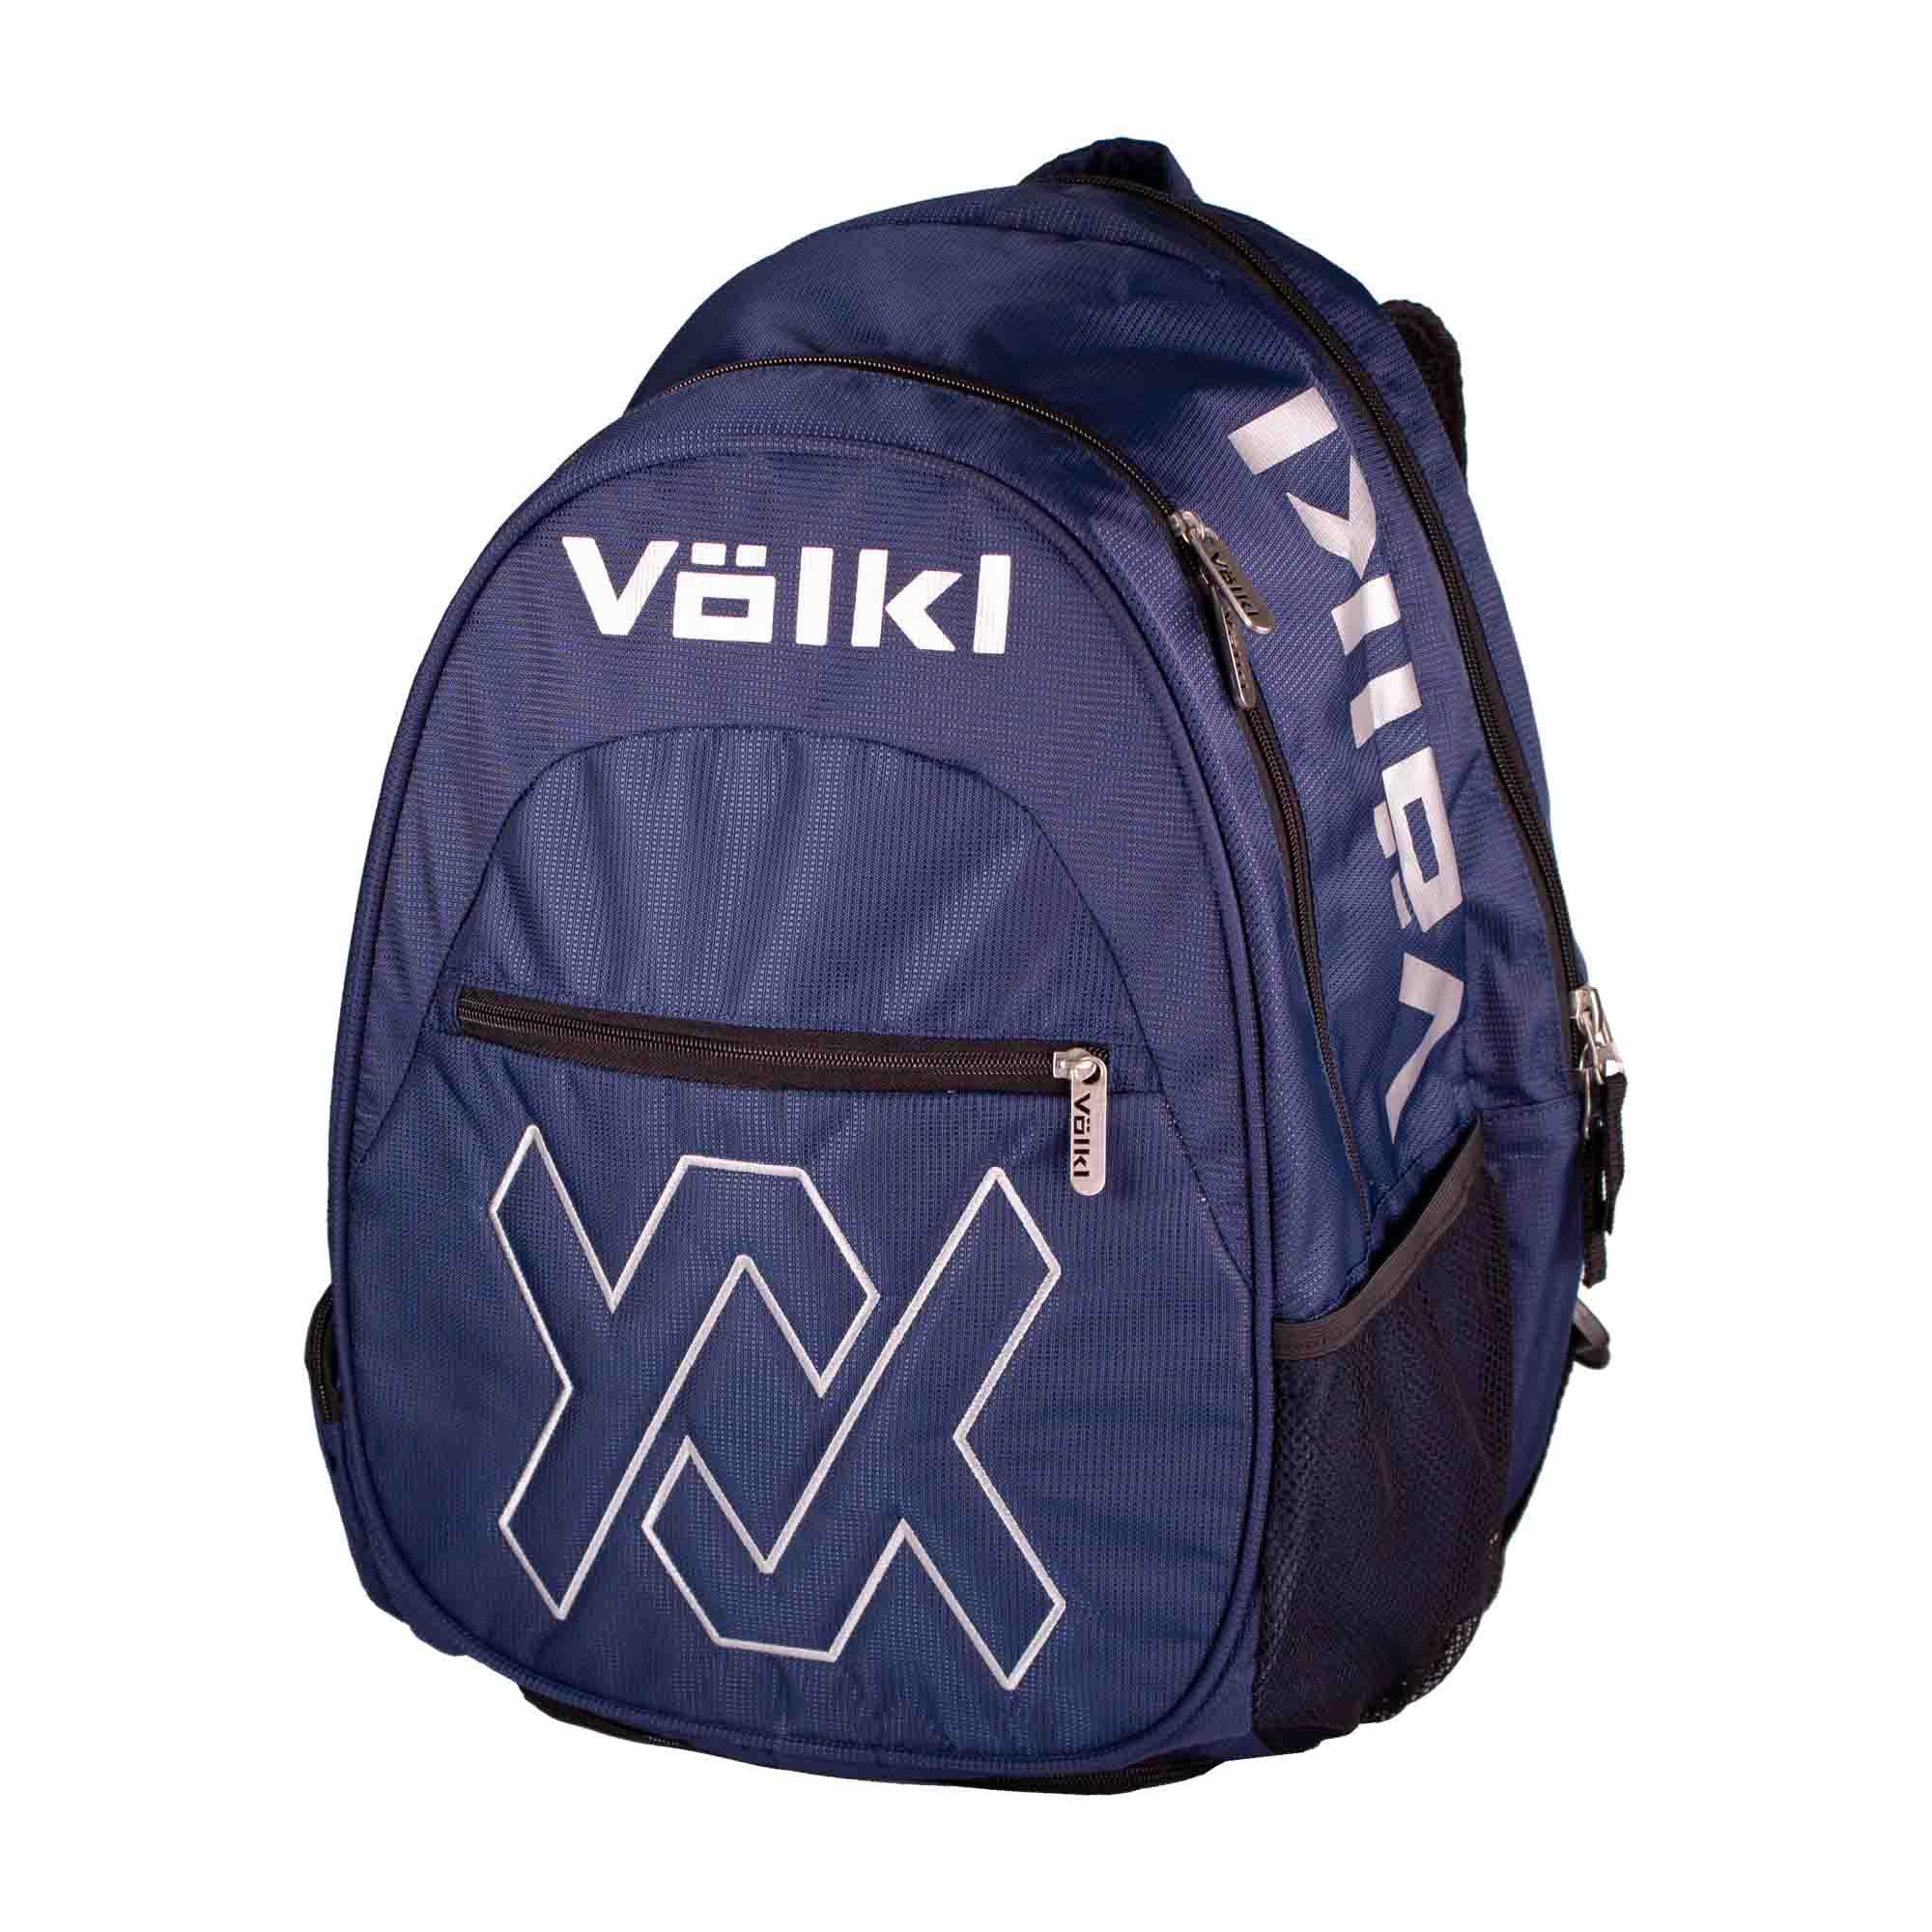 Volkl Team Backpack - Navy